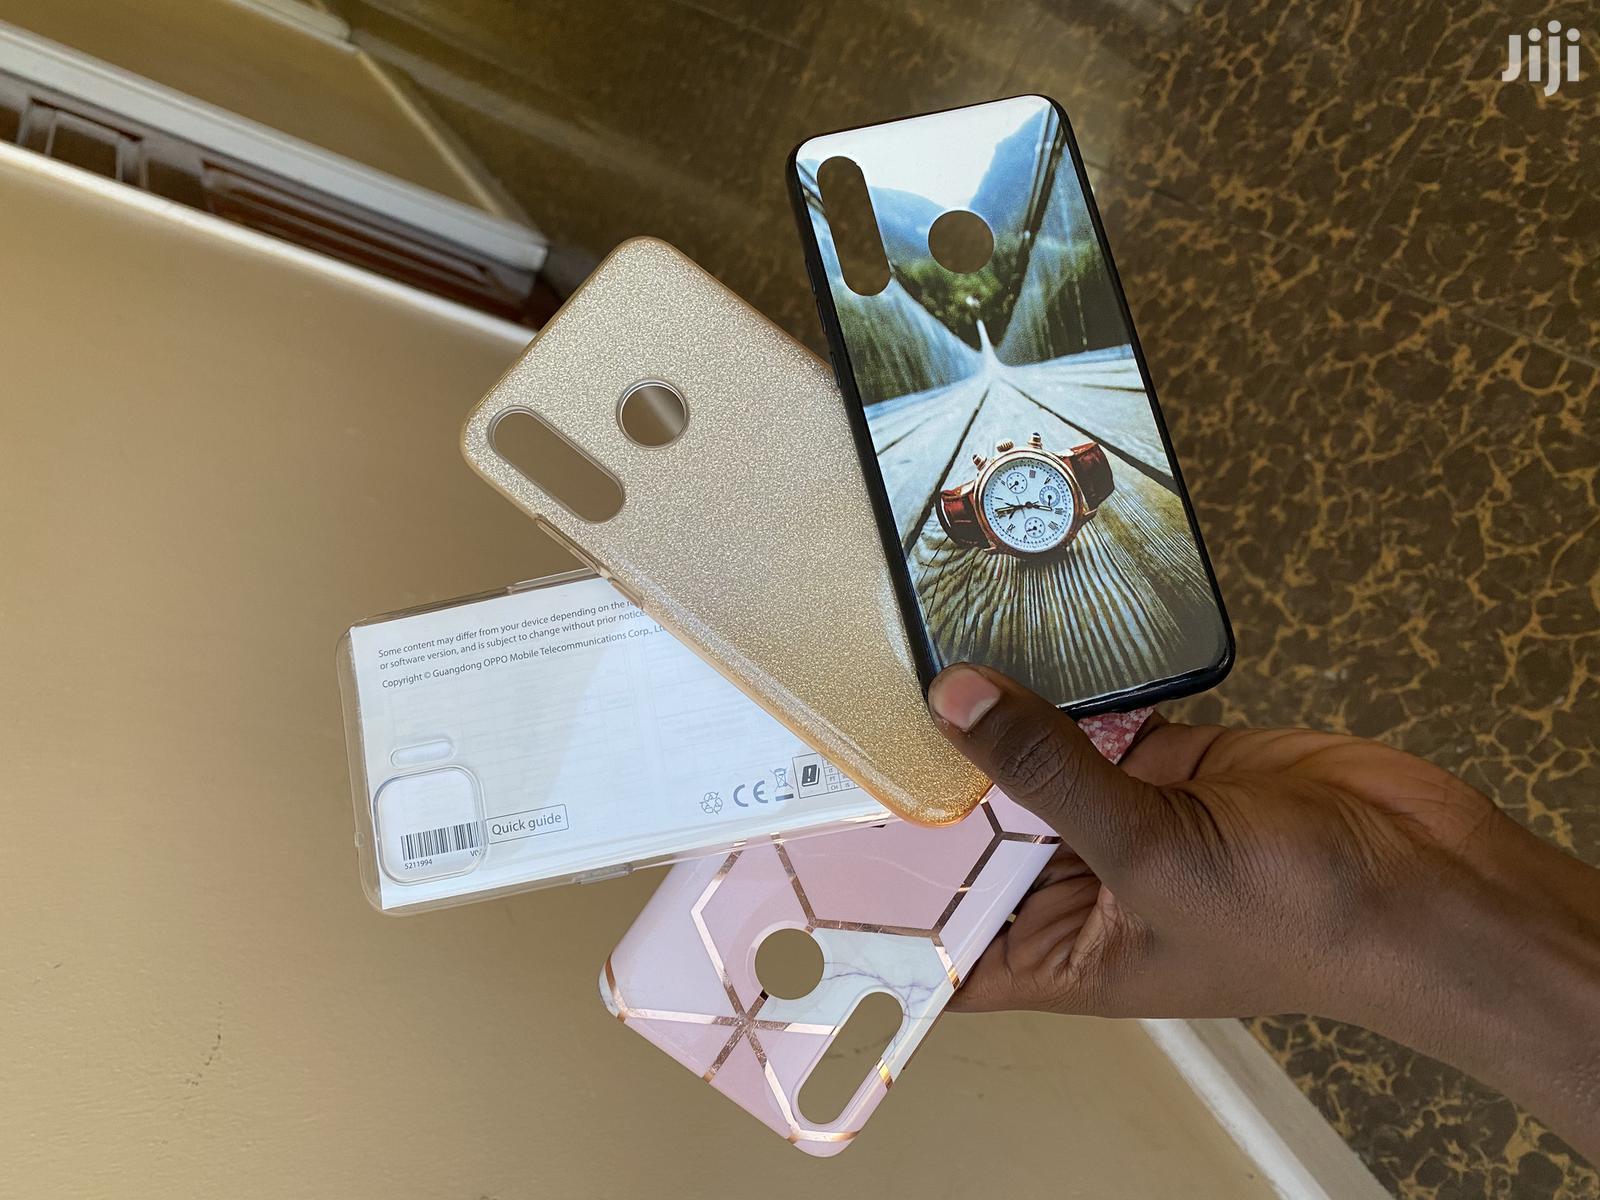 Huawei P30 Lite 128 GB Black   Mobile Phones for sale in Nairobi Central, Nairobi, Kenya